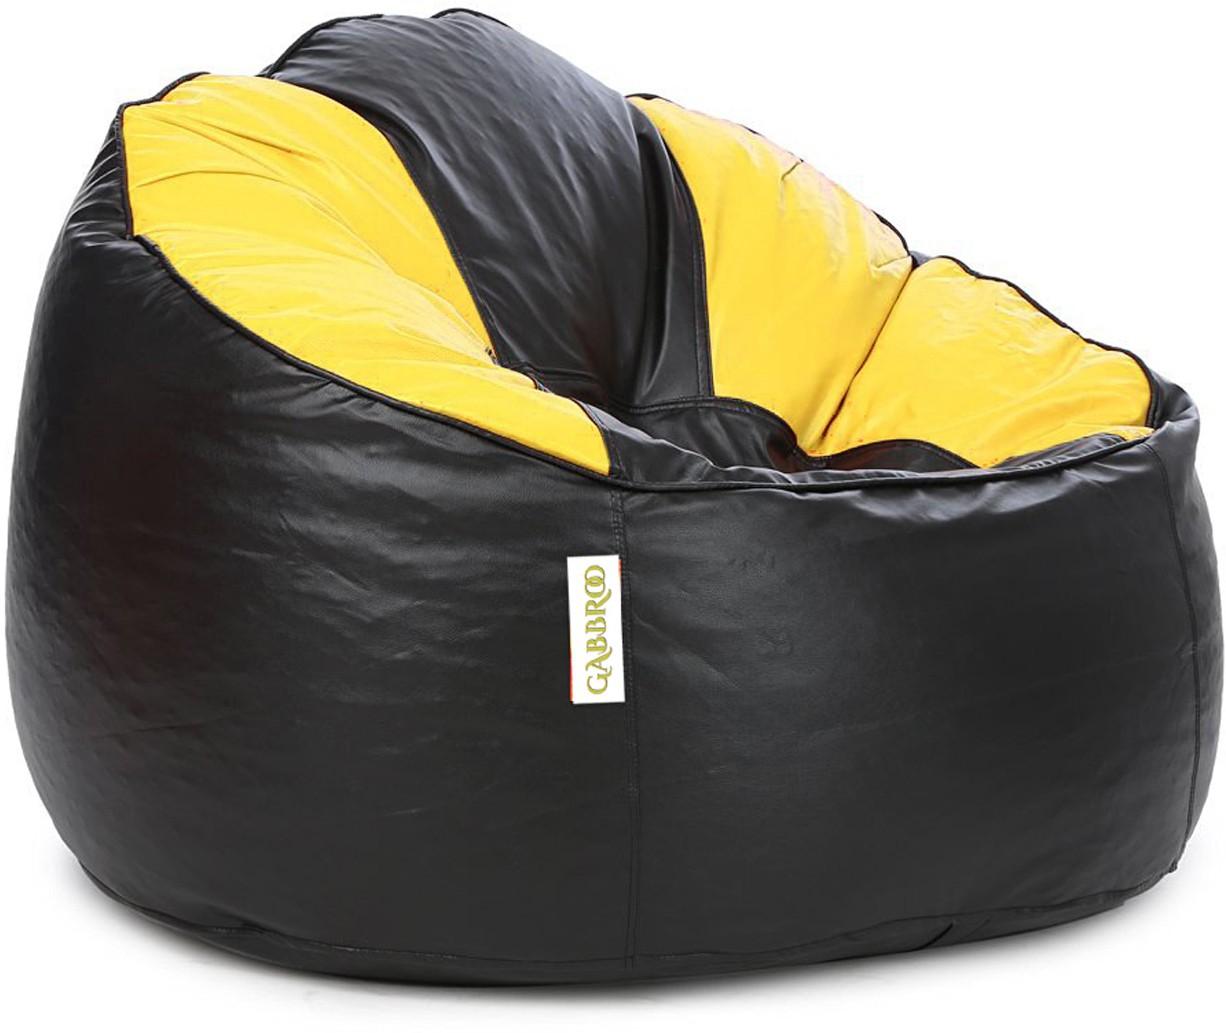 View Gabbroo XXXL Lounger Bean Bag Cover(Yellow, Black) Furniture